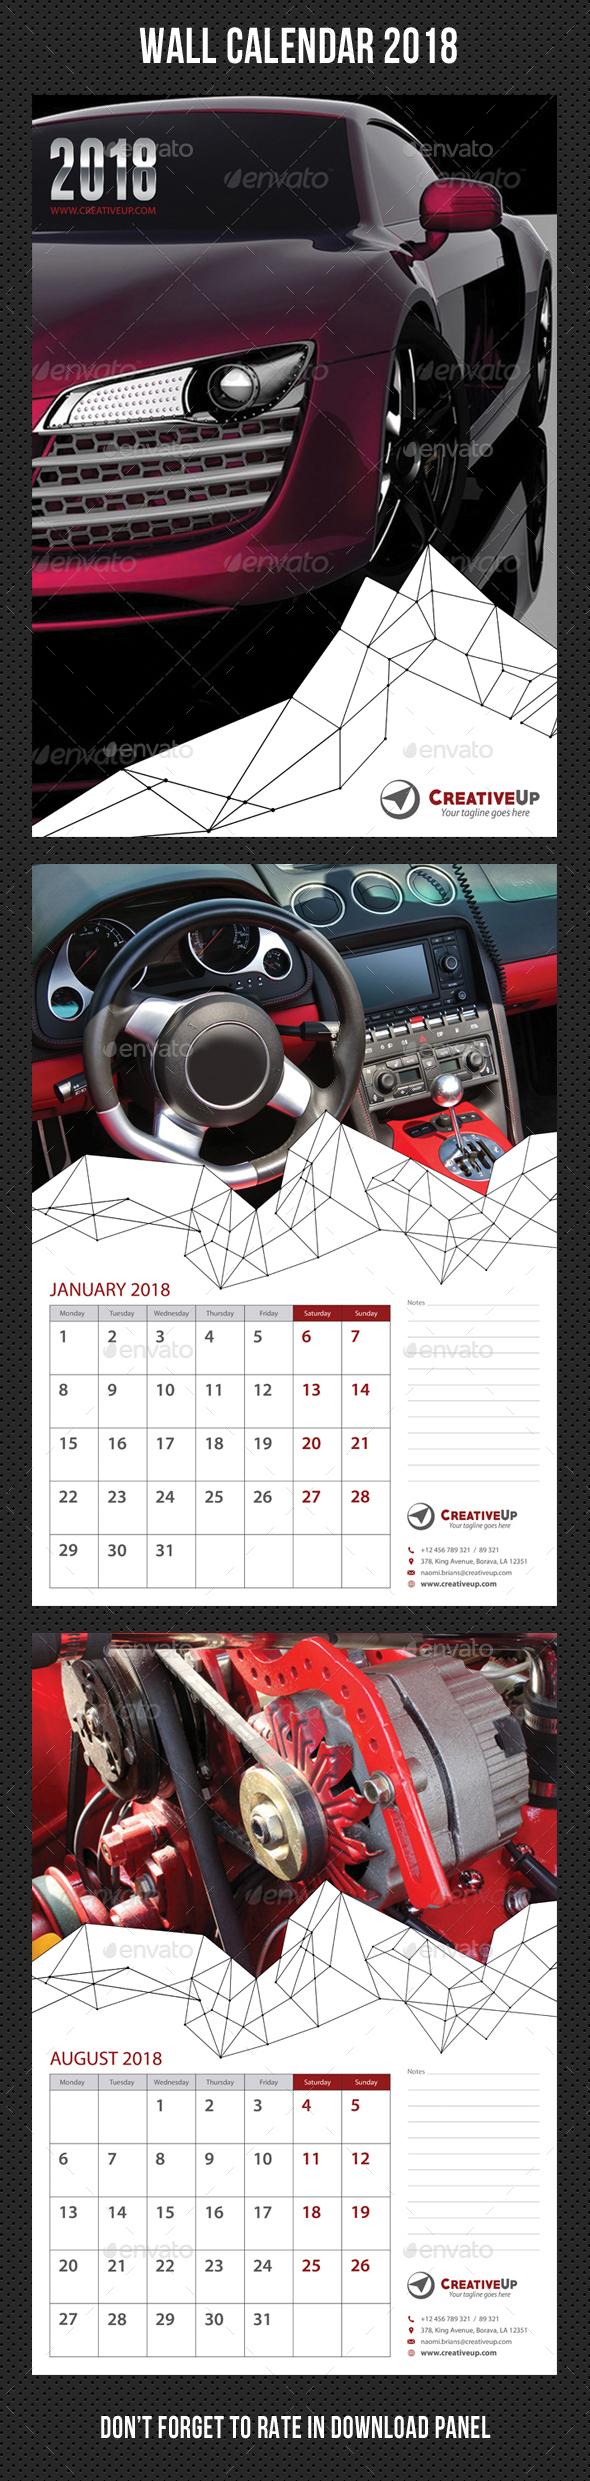 Wall Calendar 2018 V03 - Calendars Stationery